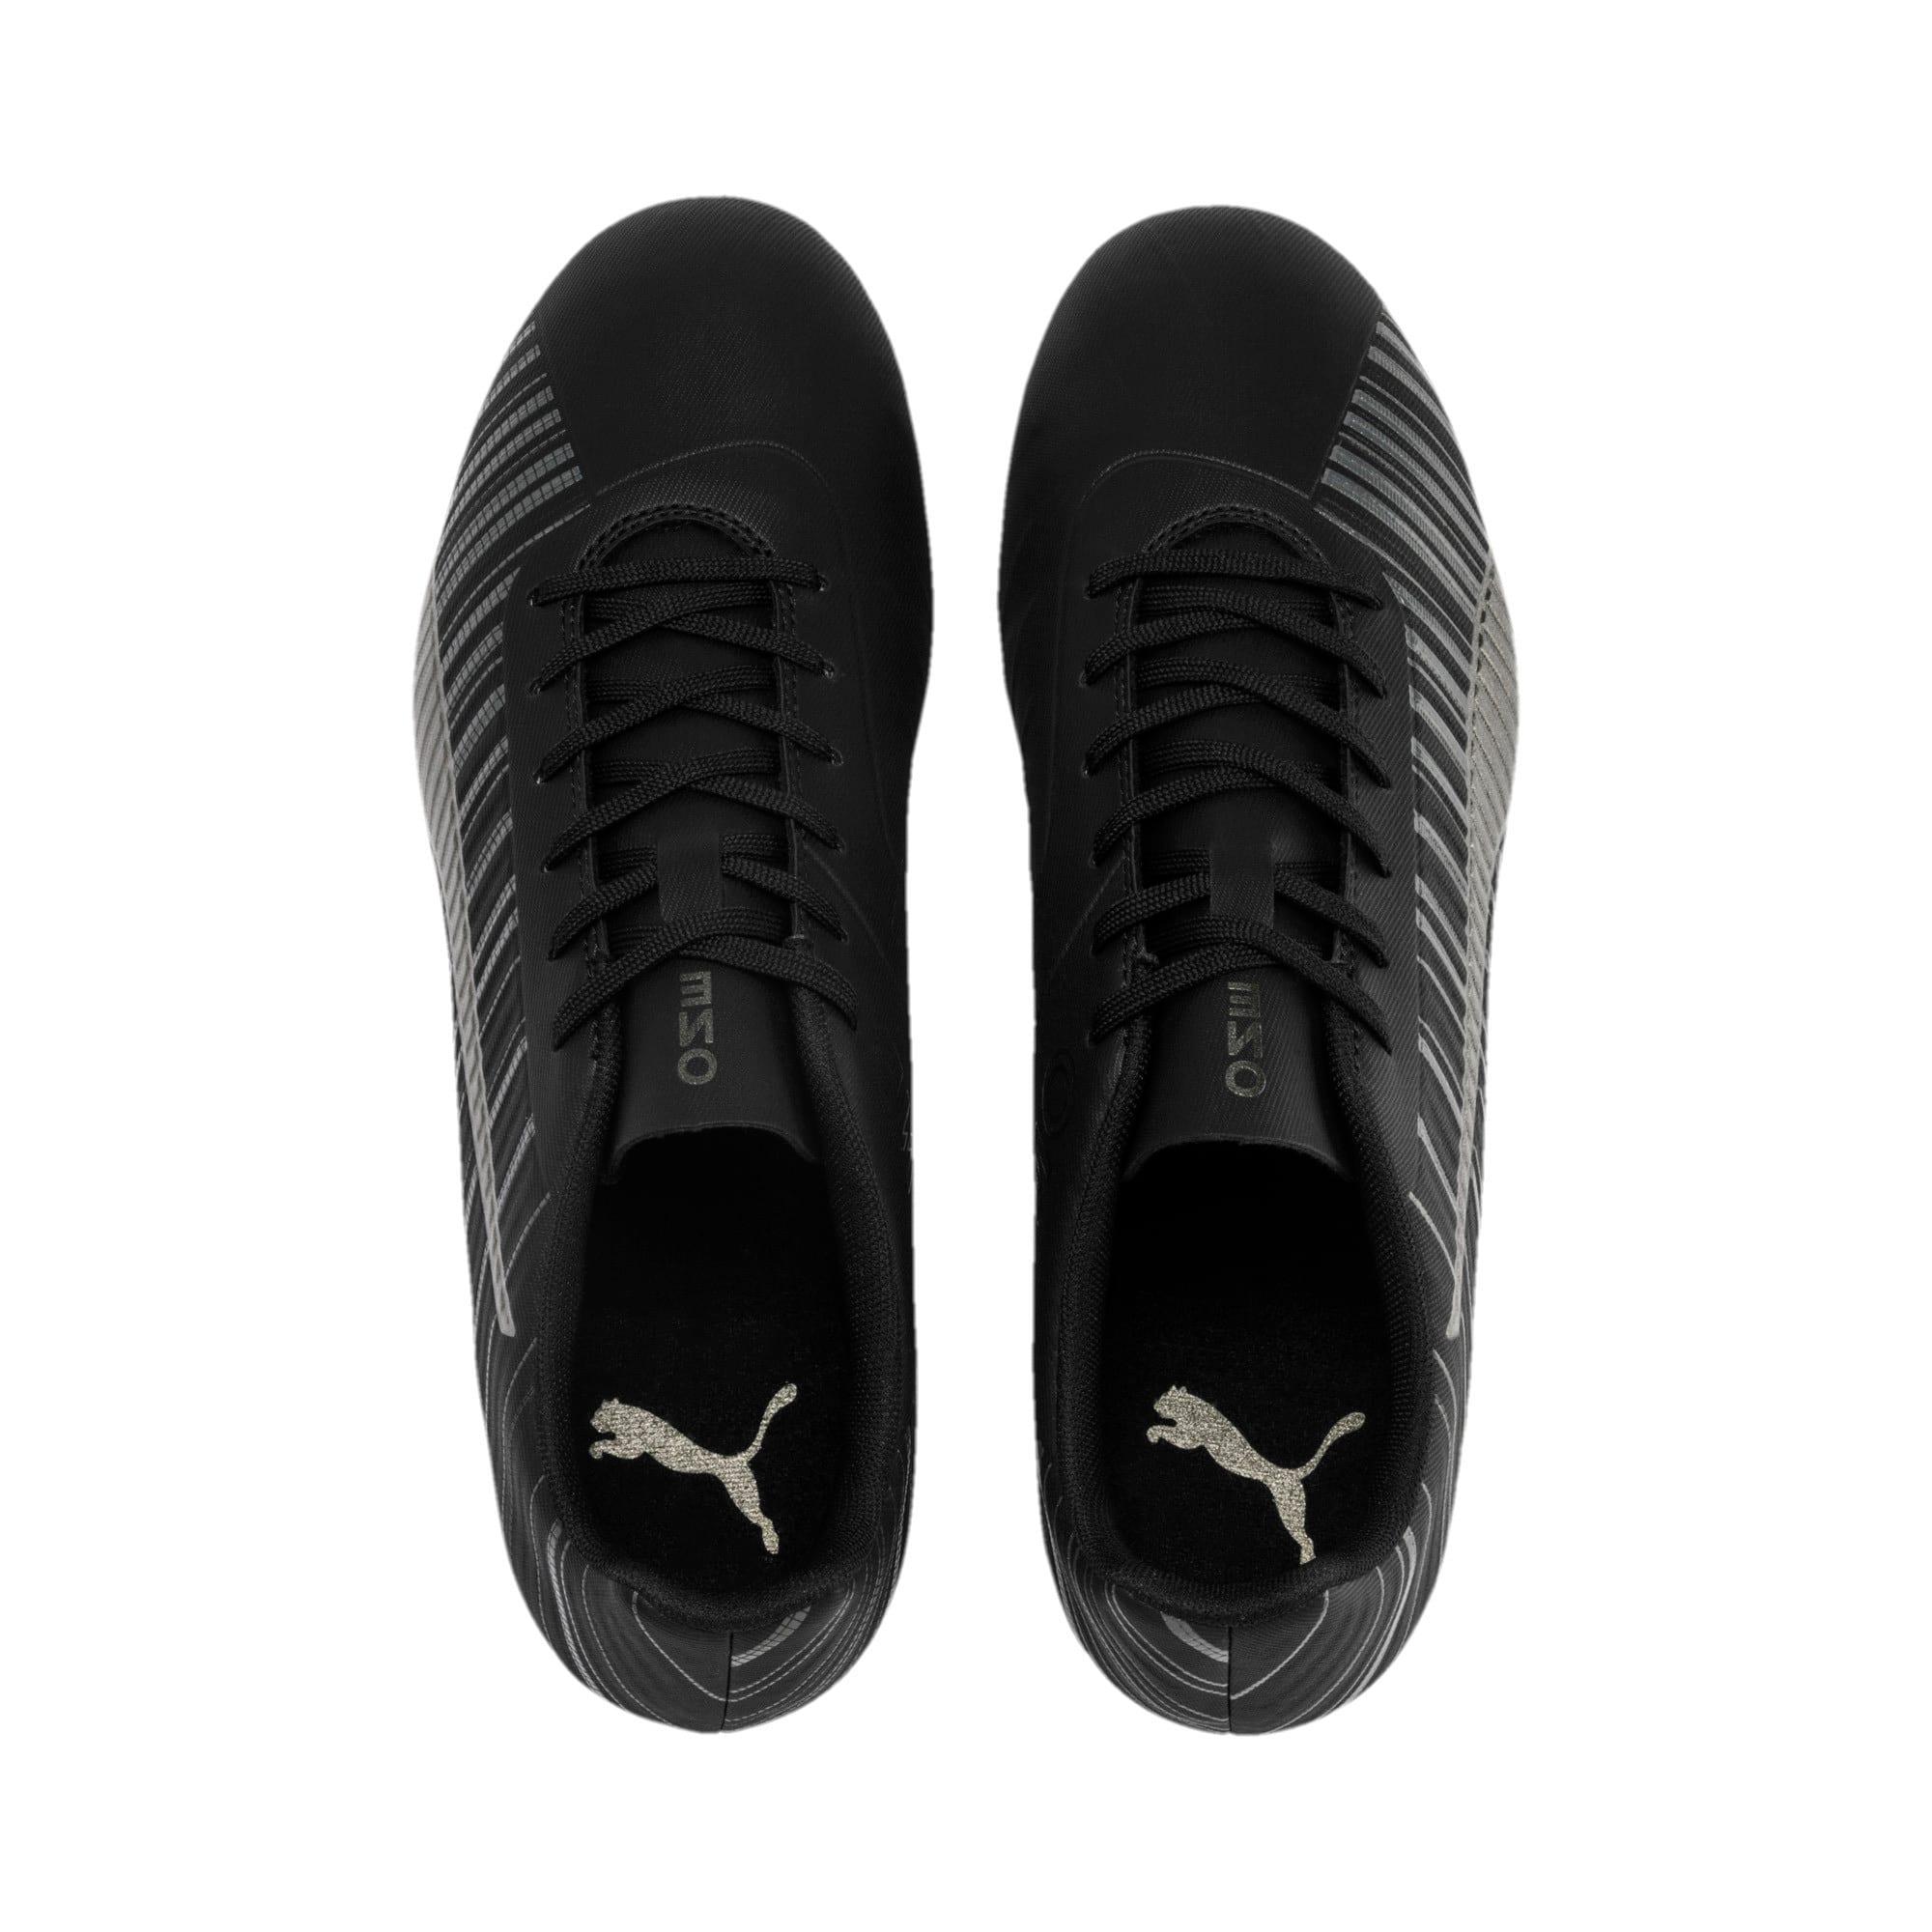 Thumbnail 7 of PUMA ONE 5.4 FG/AG Men's Soccer Cleats, Black-Black-Puma Aged Silver, medium